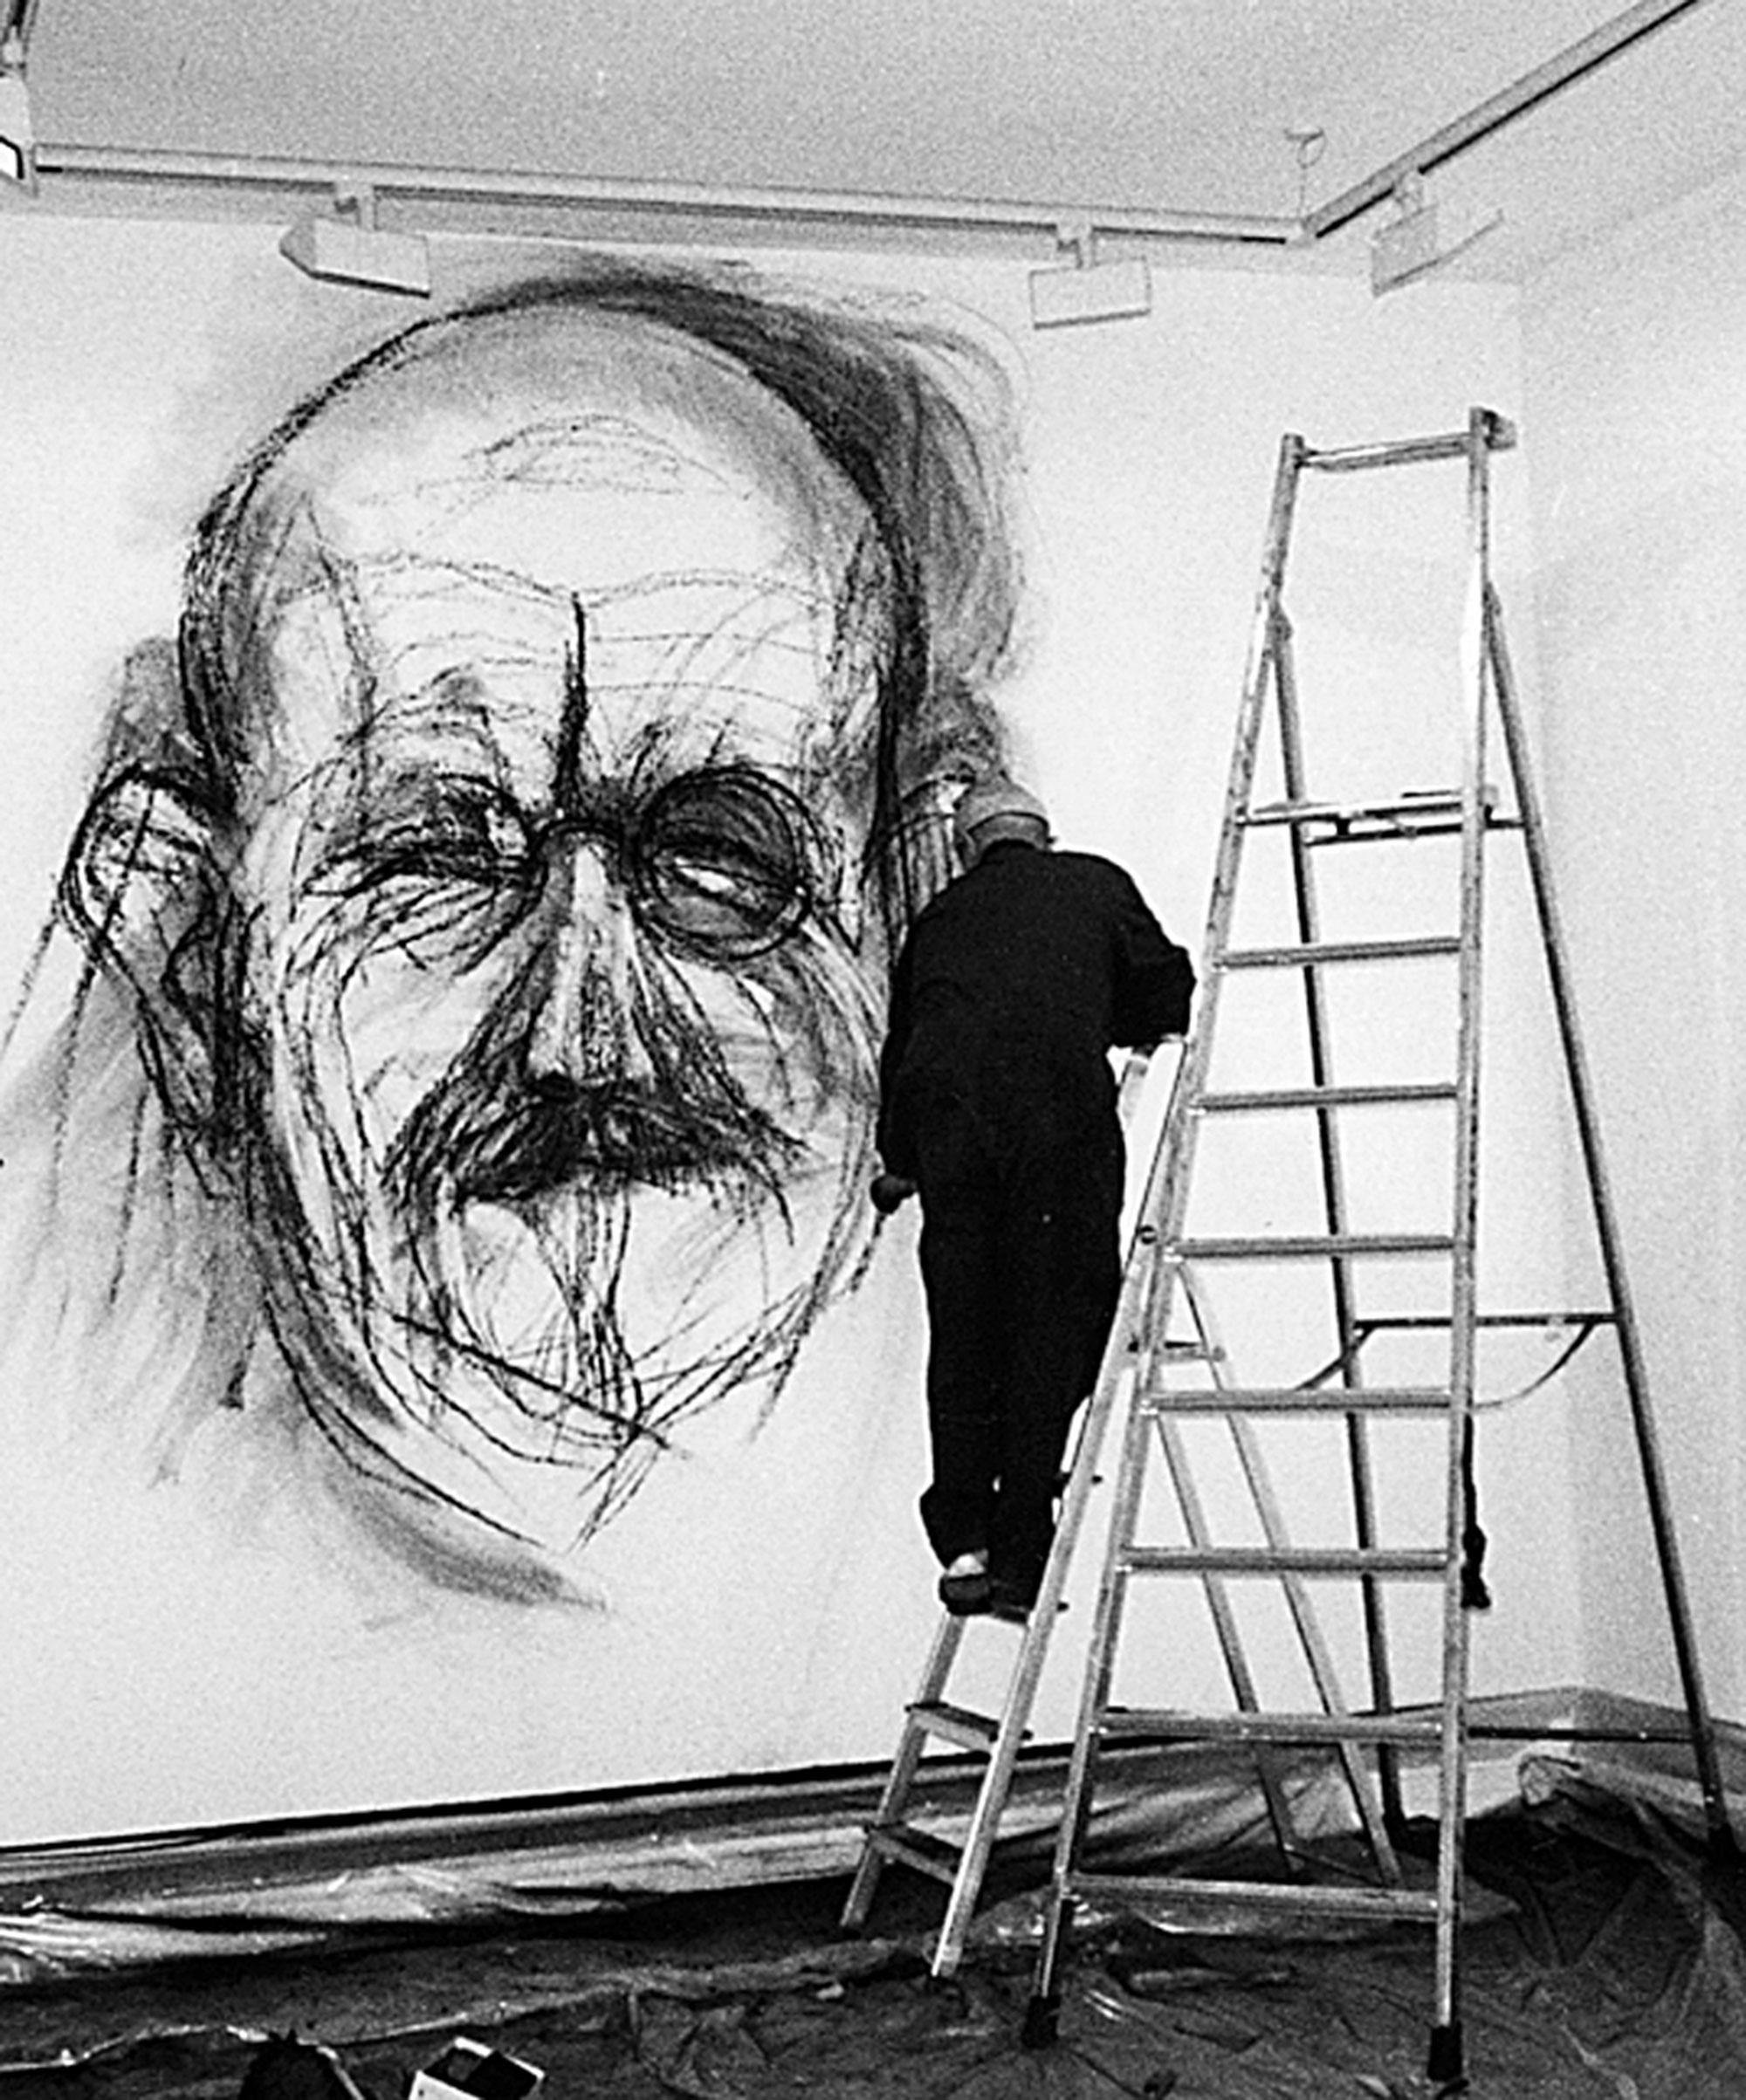 Jim Dine Self Portrait On The Walls Wsu News Washington State